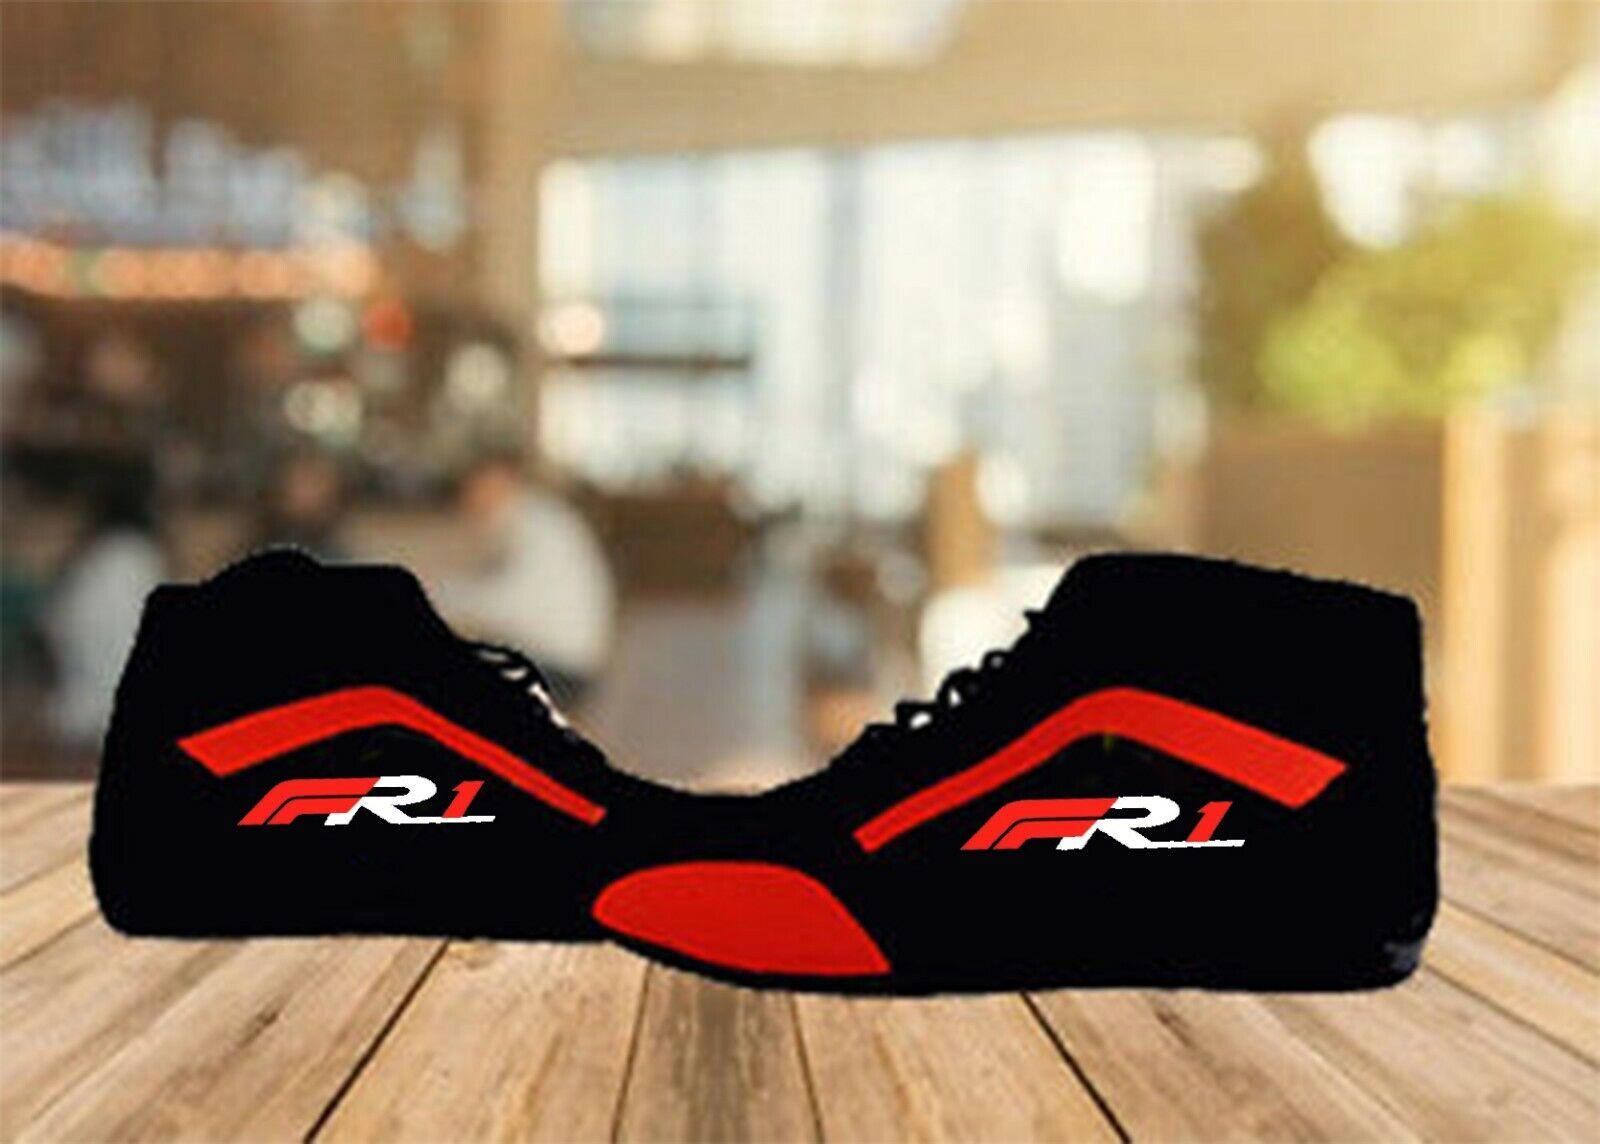 FR-1 karting shoes driving kart racing shoe go kart racing boots-Exclusive offer